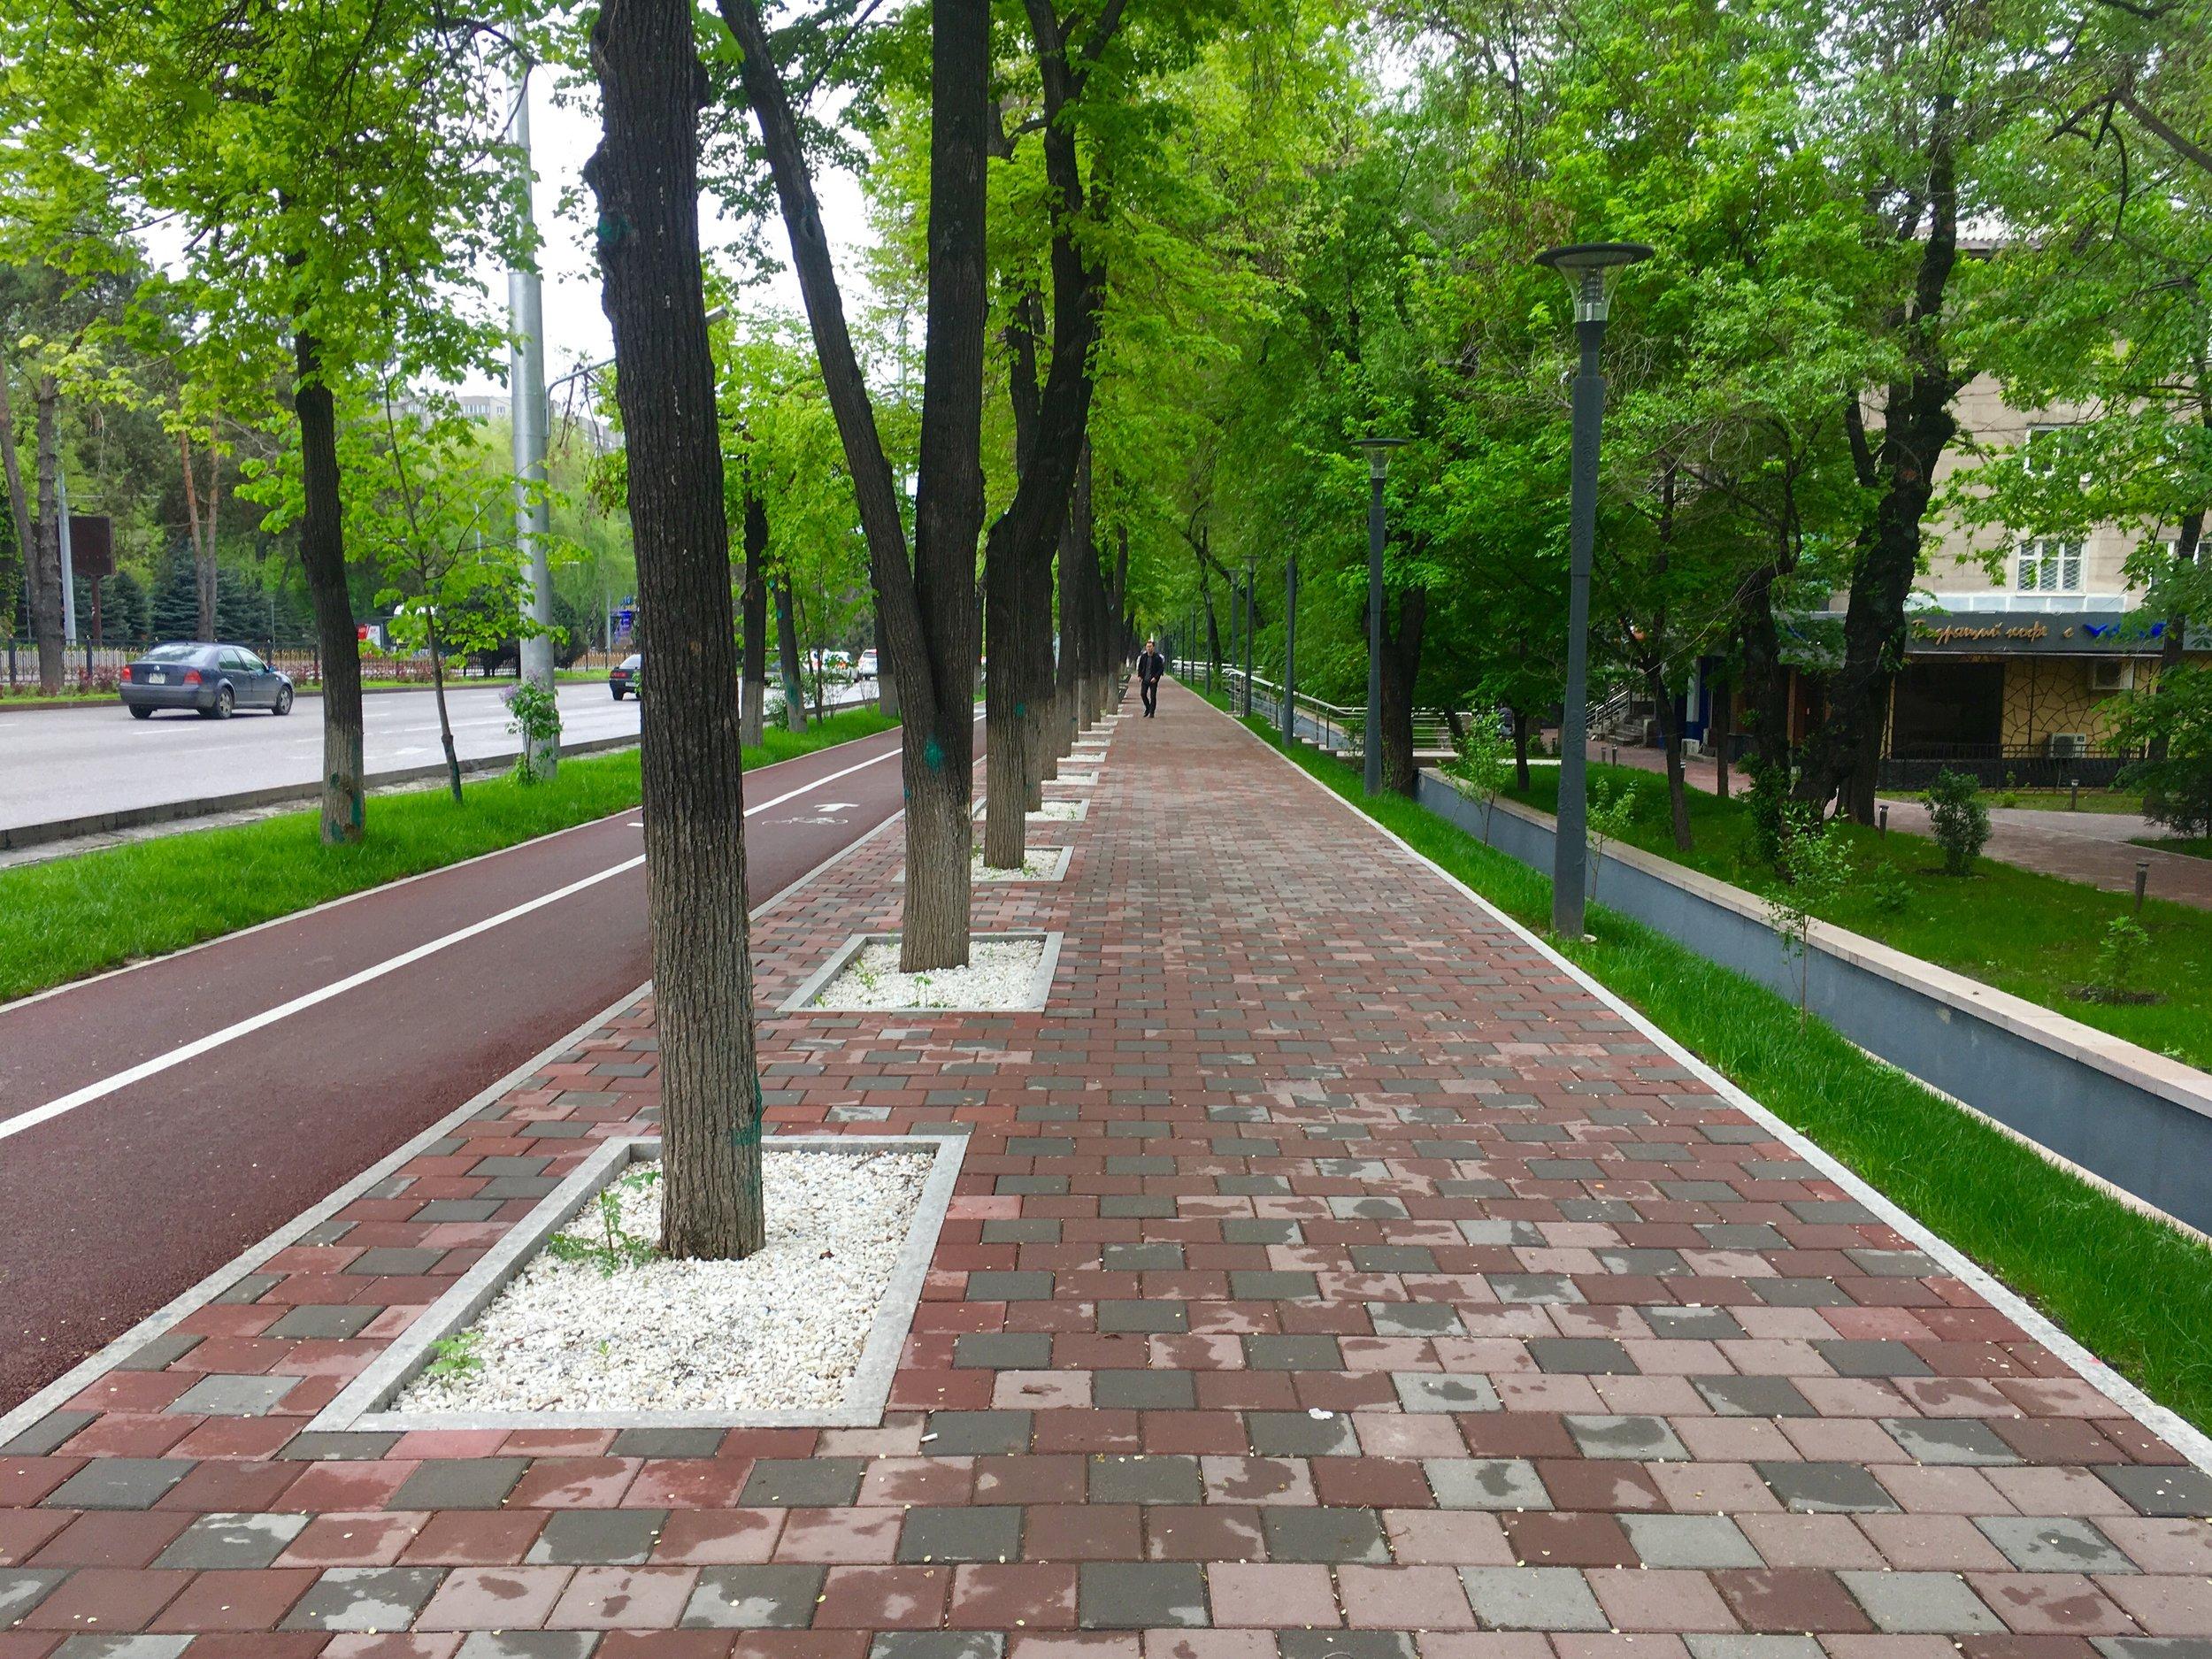 Almaty, street design accommodating pedestrian, cycling, green and blue infrastructure. photo: Milota Sidorova